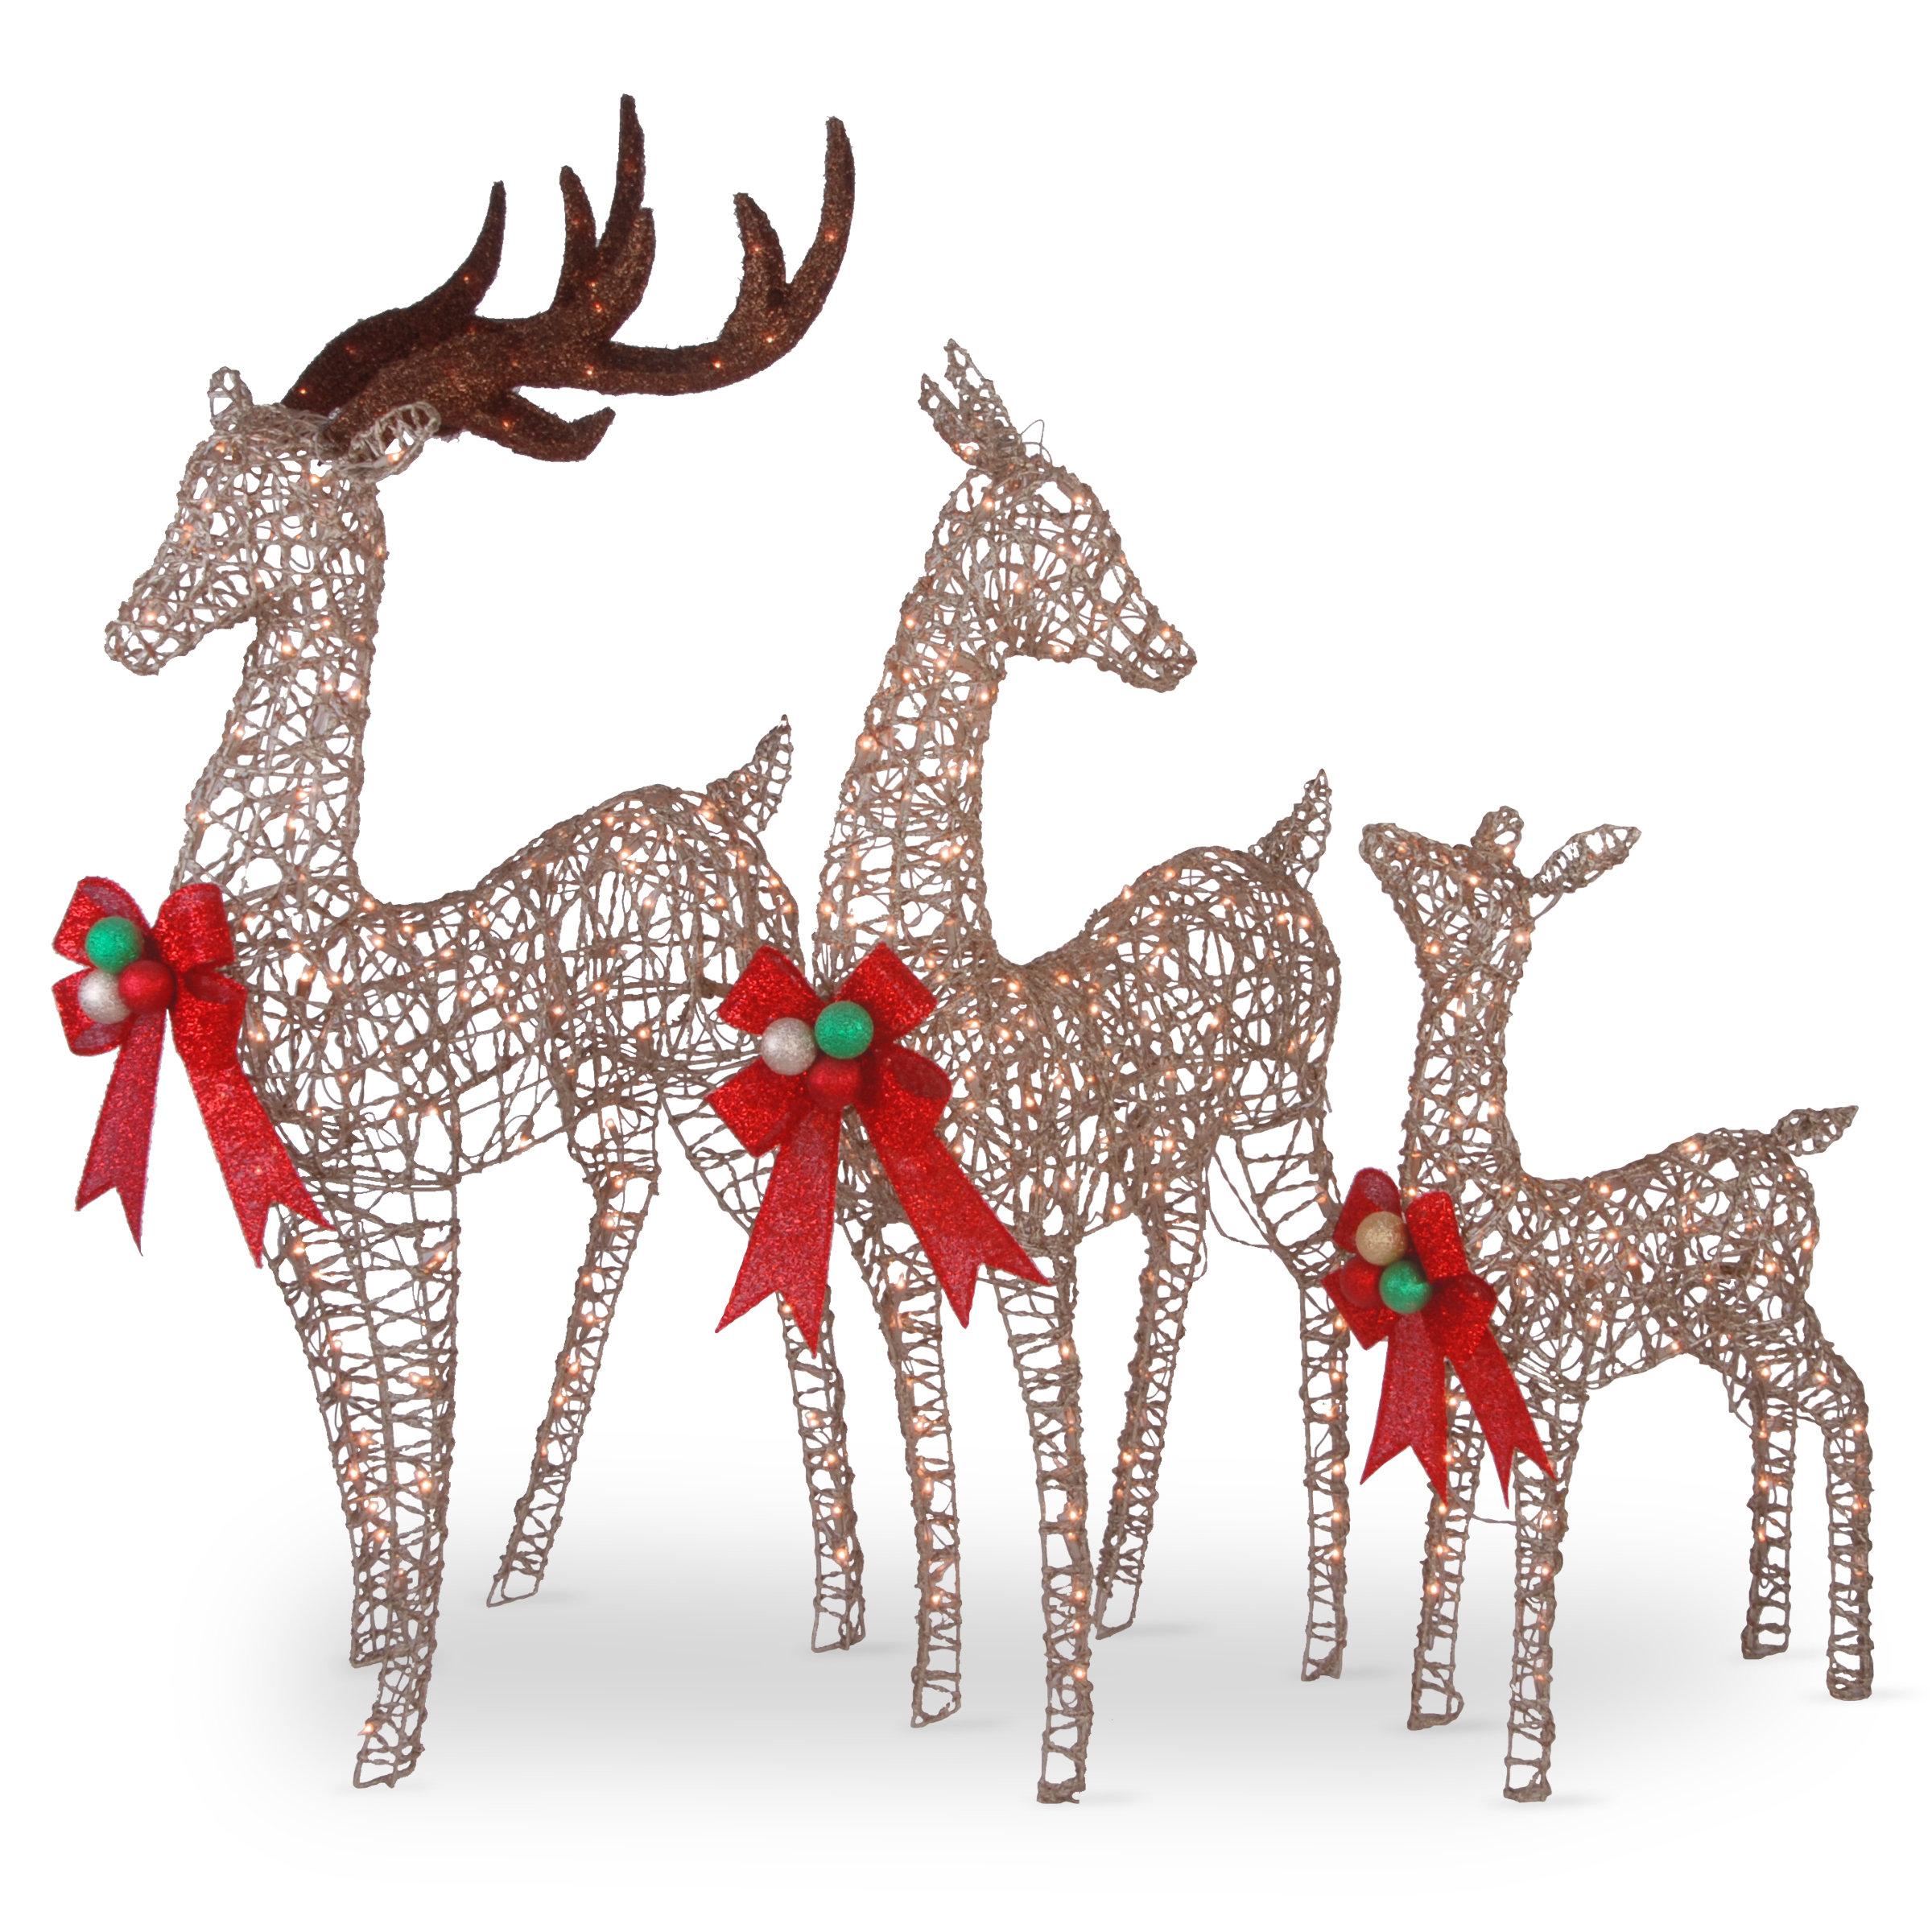 3 Piece Deer Family Assortment Lighted Display Set Reviews Birch Lane